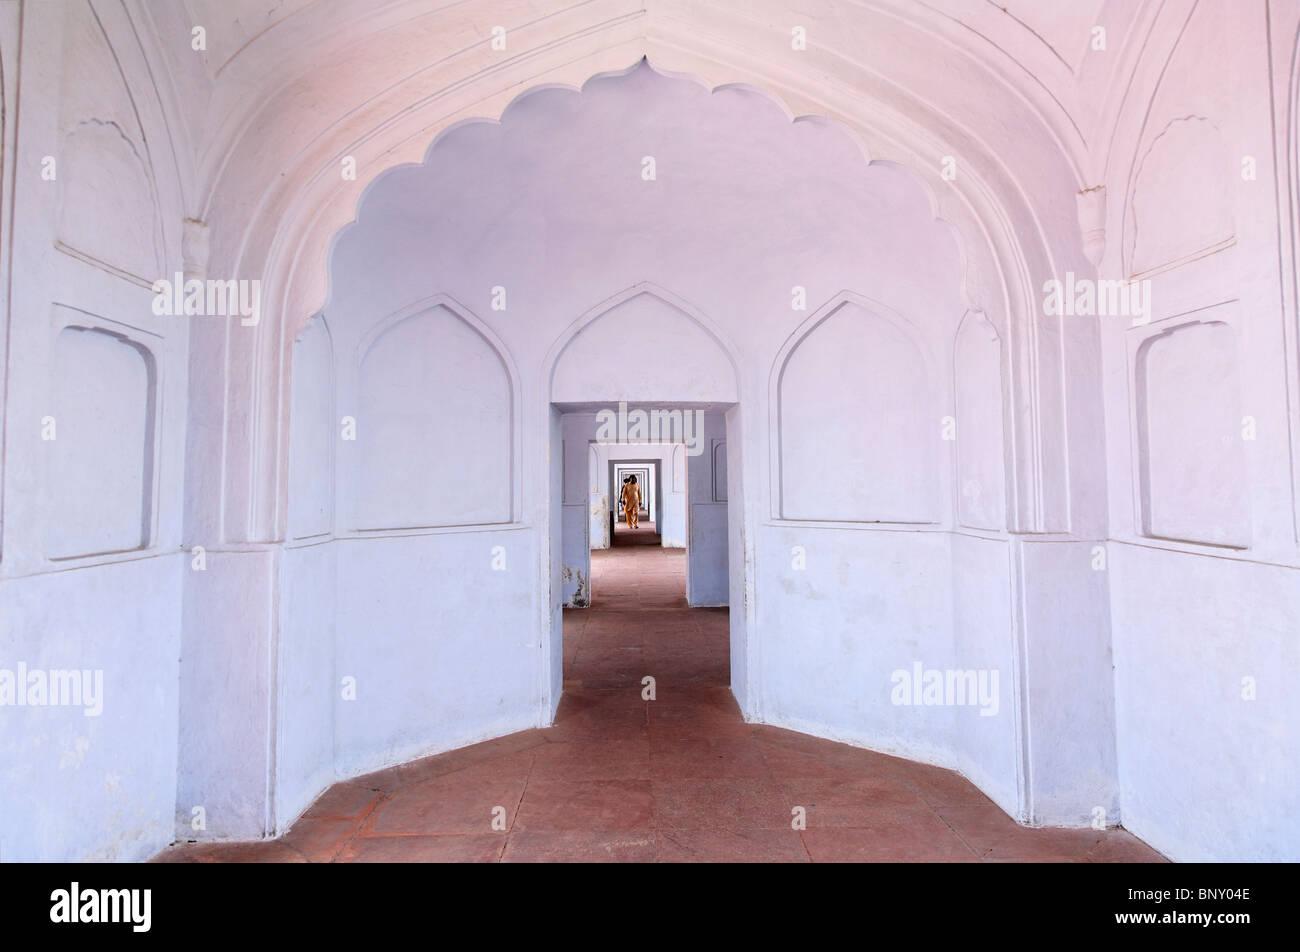 Pakistan - Punjab - Lahore - Corridor at the Badshahi mosque - Stock Image